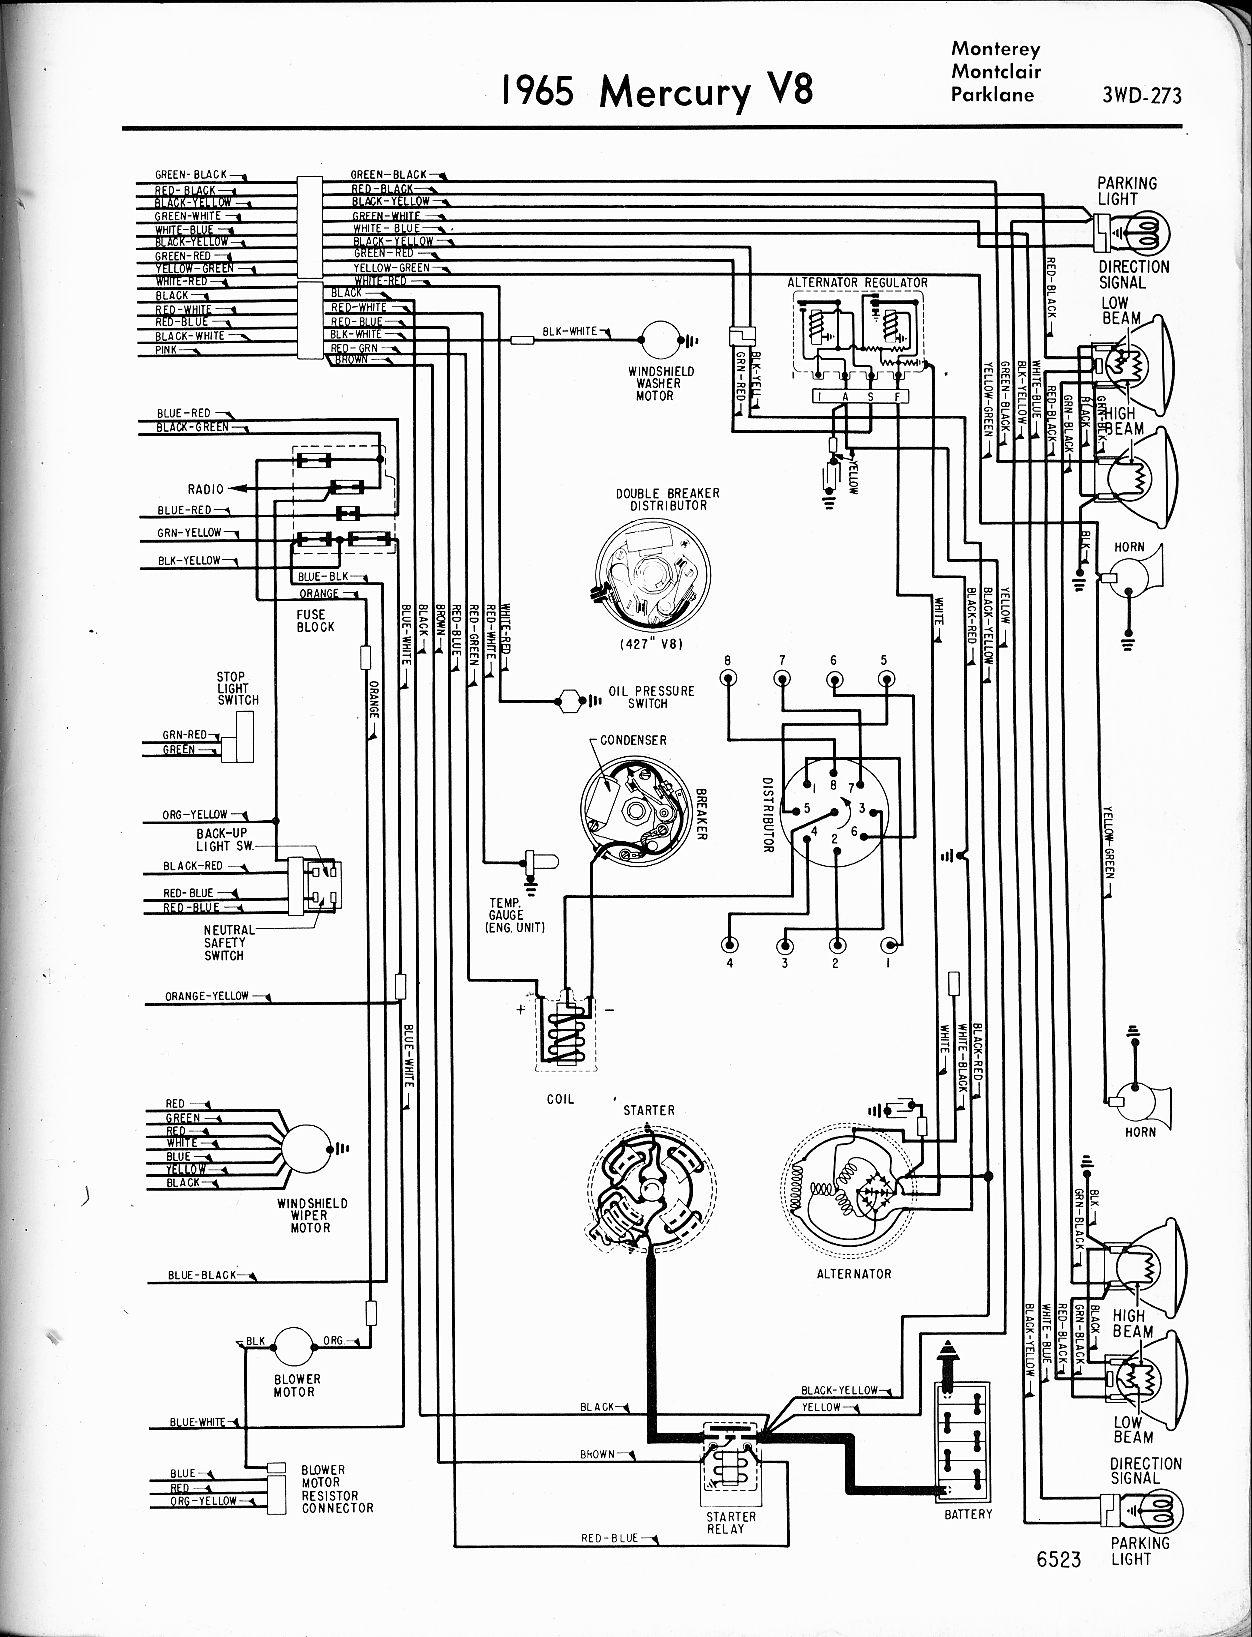 Diagram 2001 Cougar Wiring Diagram Full Version Hd Quality Wiring Diagram Mediagrame Cefalubb It